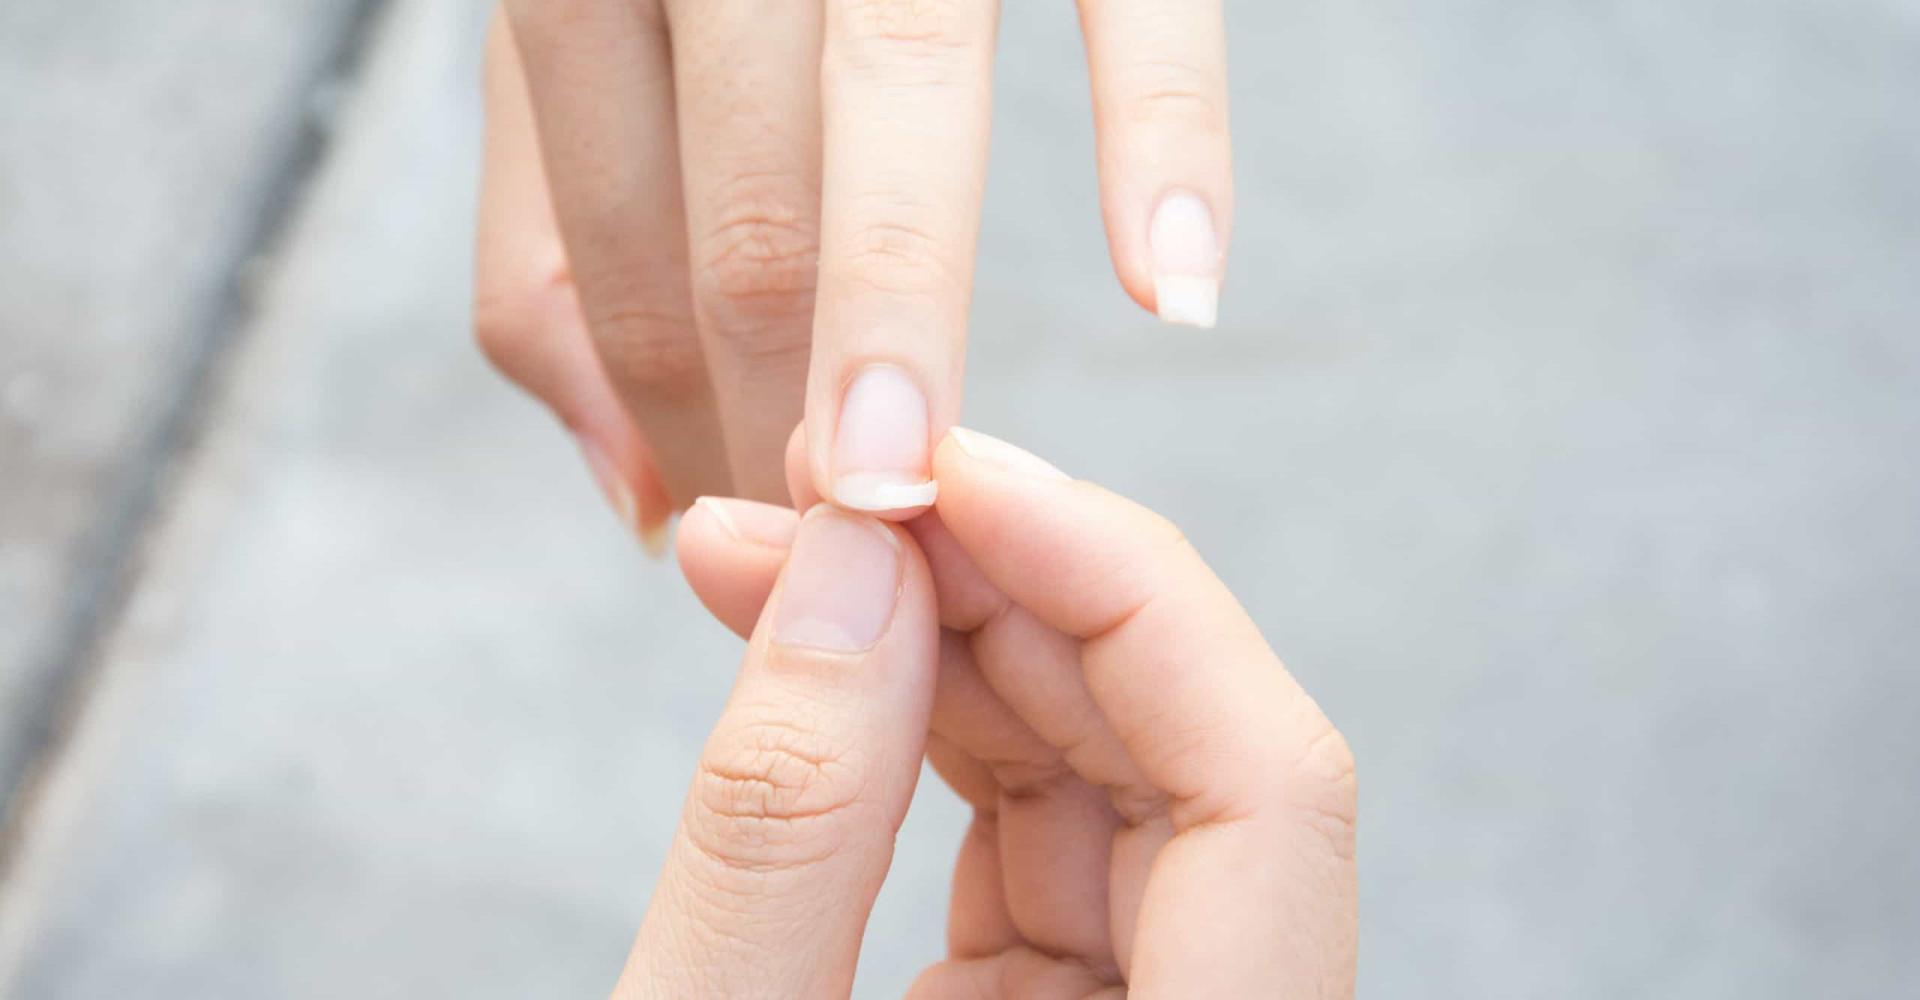 Zo herstel je je afgebroken nagel